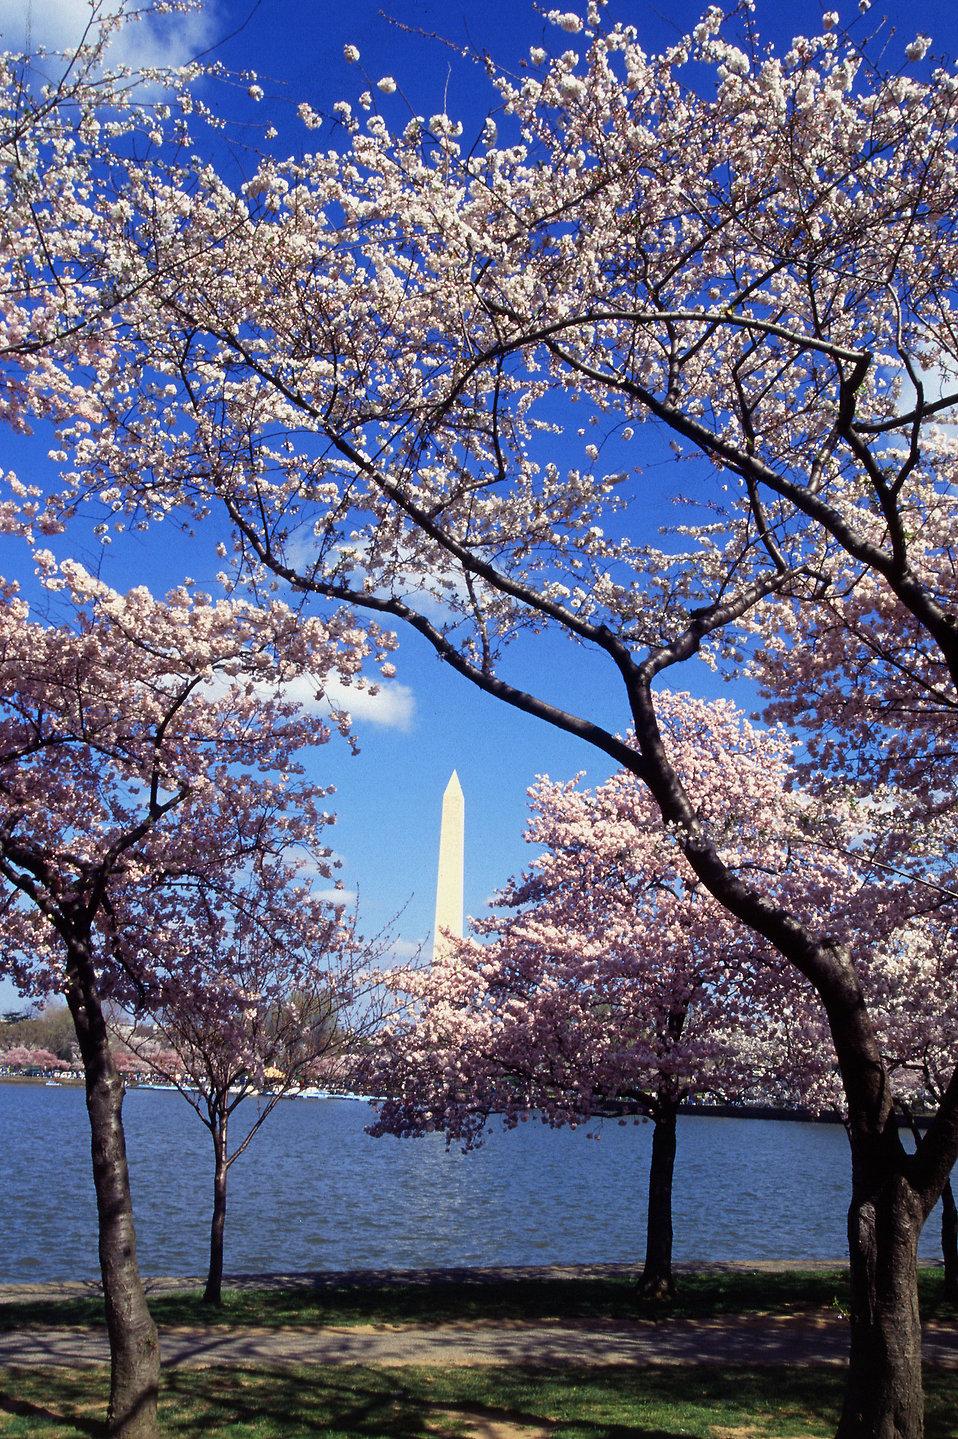 http://res.freestockphotos.biz/pictures/11/11050-resplendent-cherry-trees-from-japan-ring-the-tidal-basin-at-washington--pv.jpg